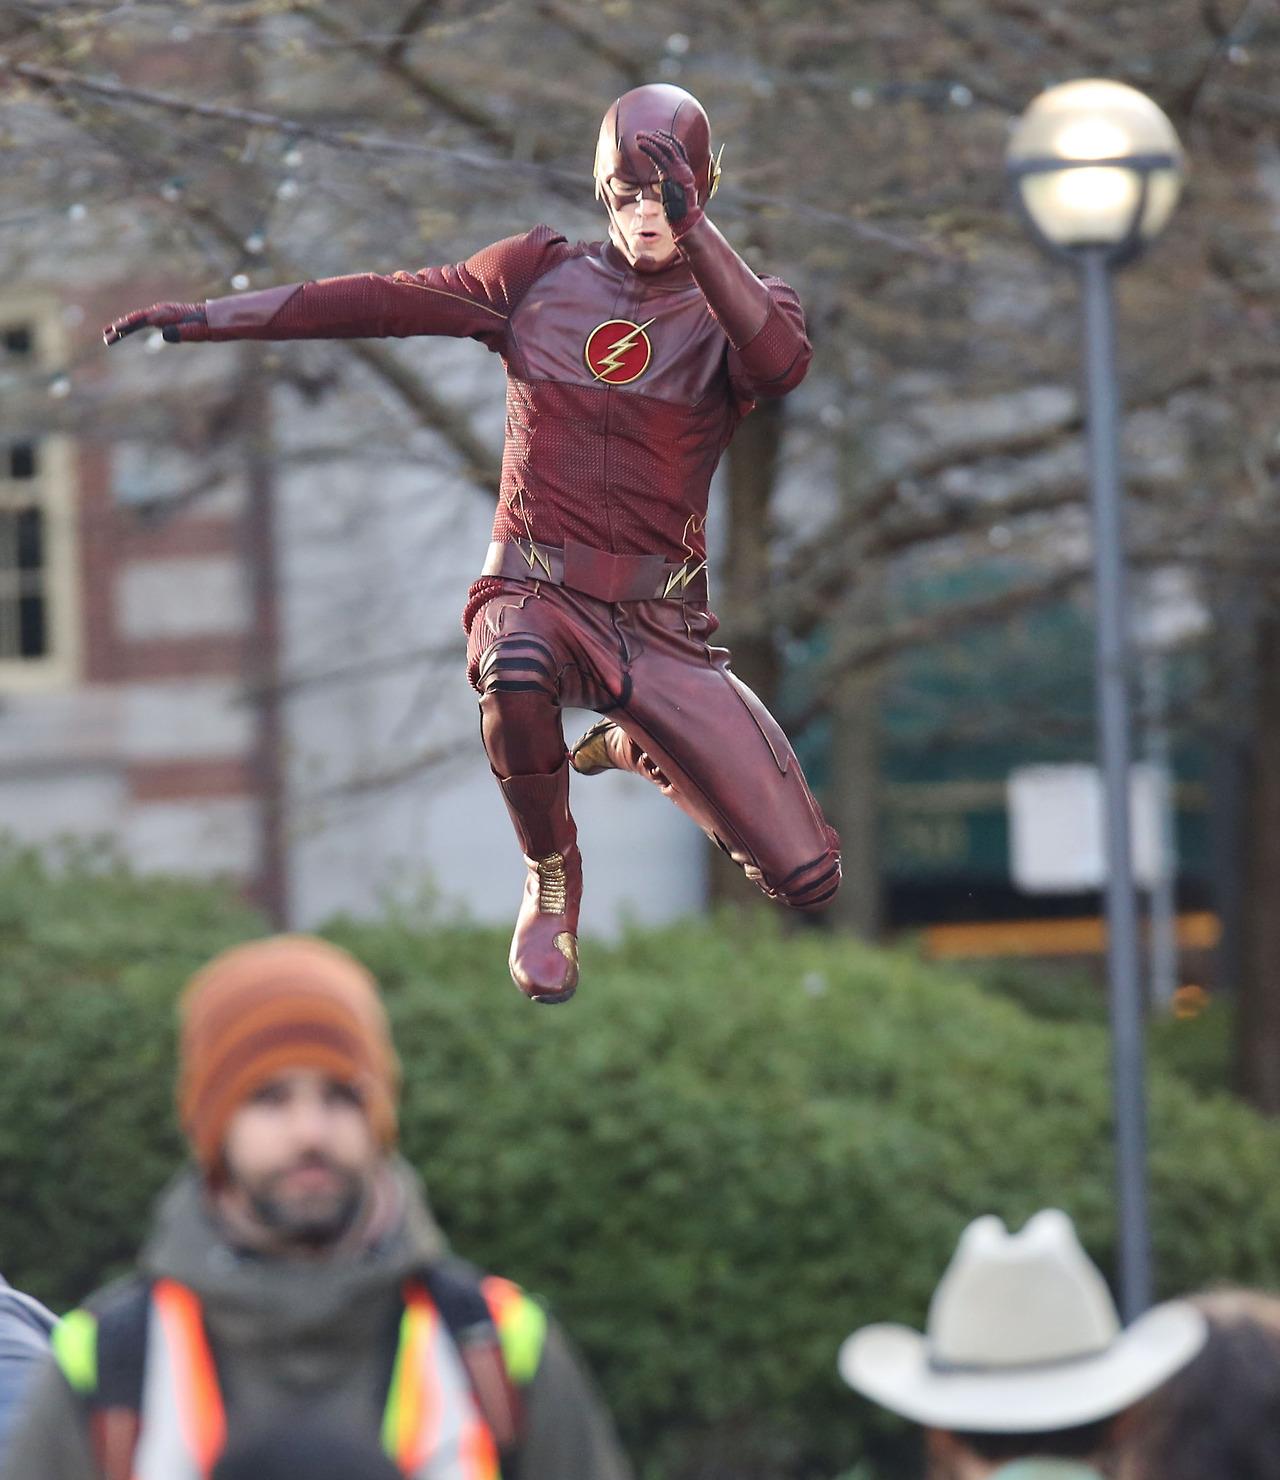 The Flash - Costume - The Flash (CW) Photo (36781373) - Fanpop